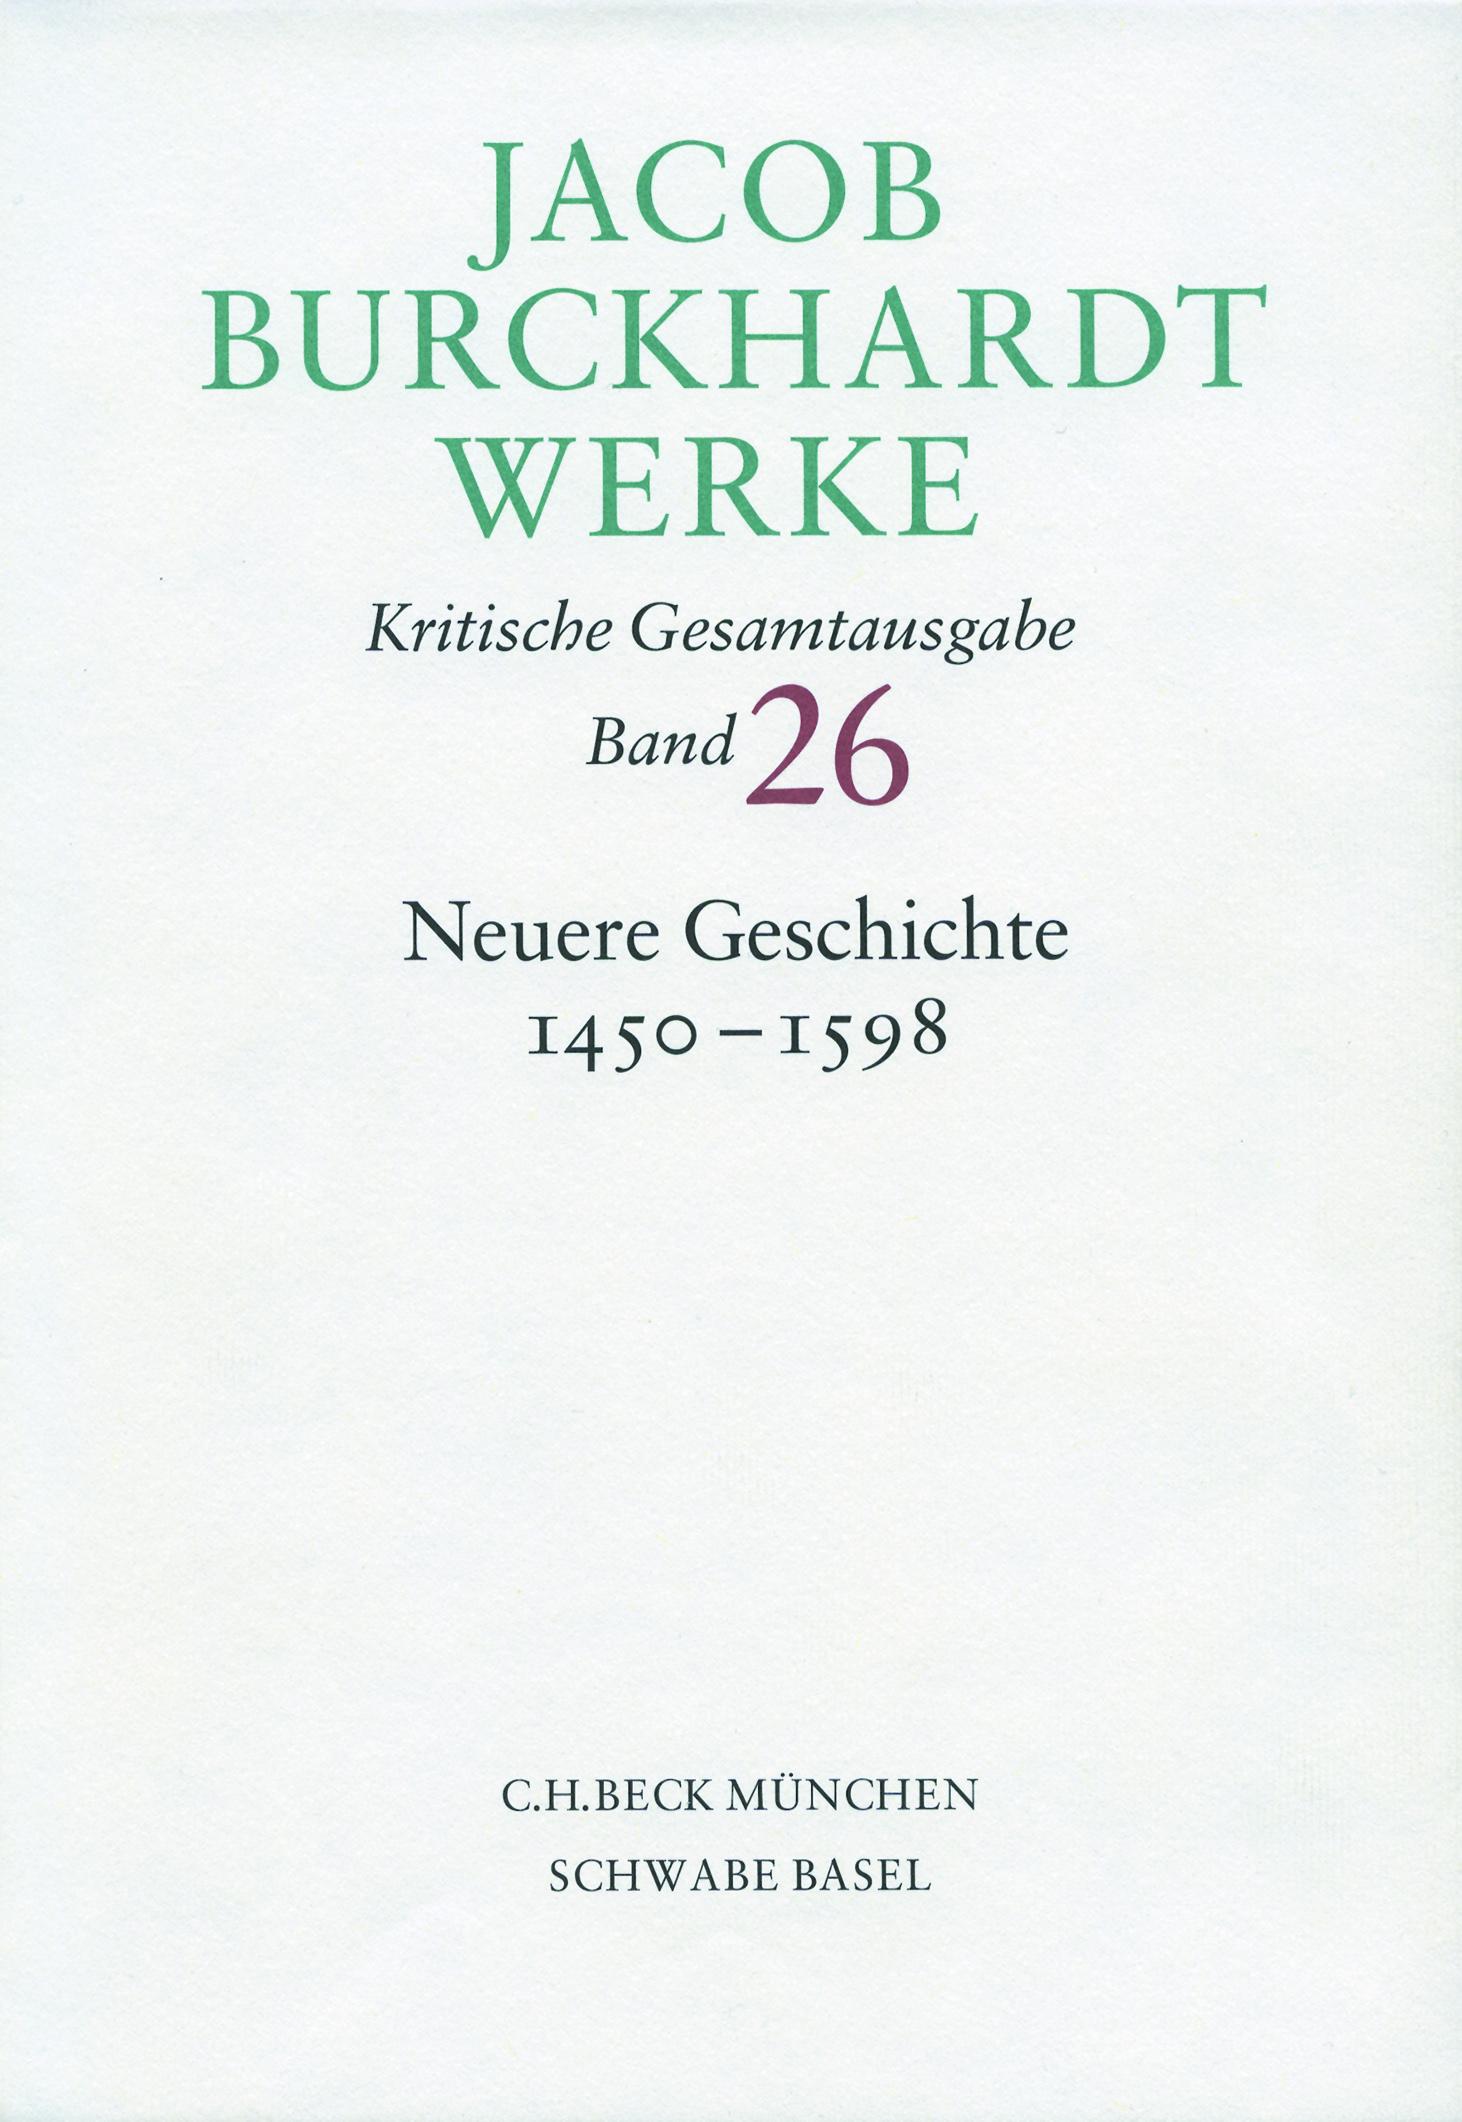 Neuerscheinung: Jacob Burckhardt Werke, Band 26: Neuere Geschichte 1450-1598